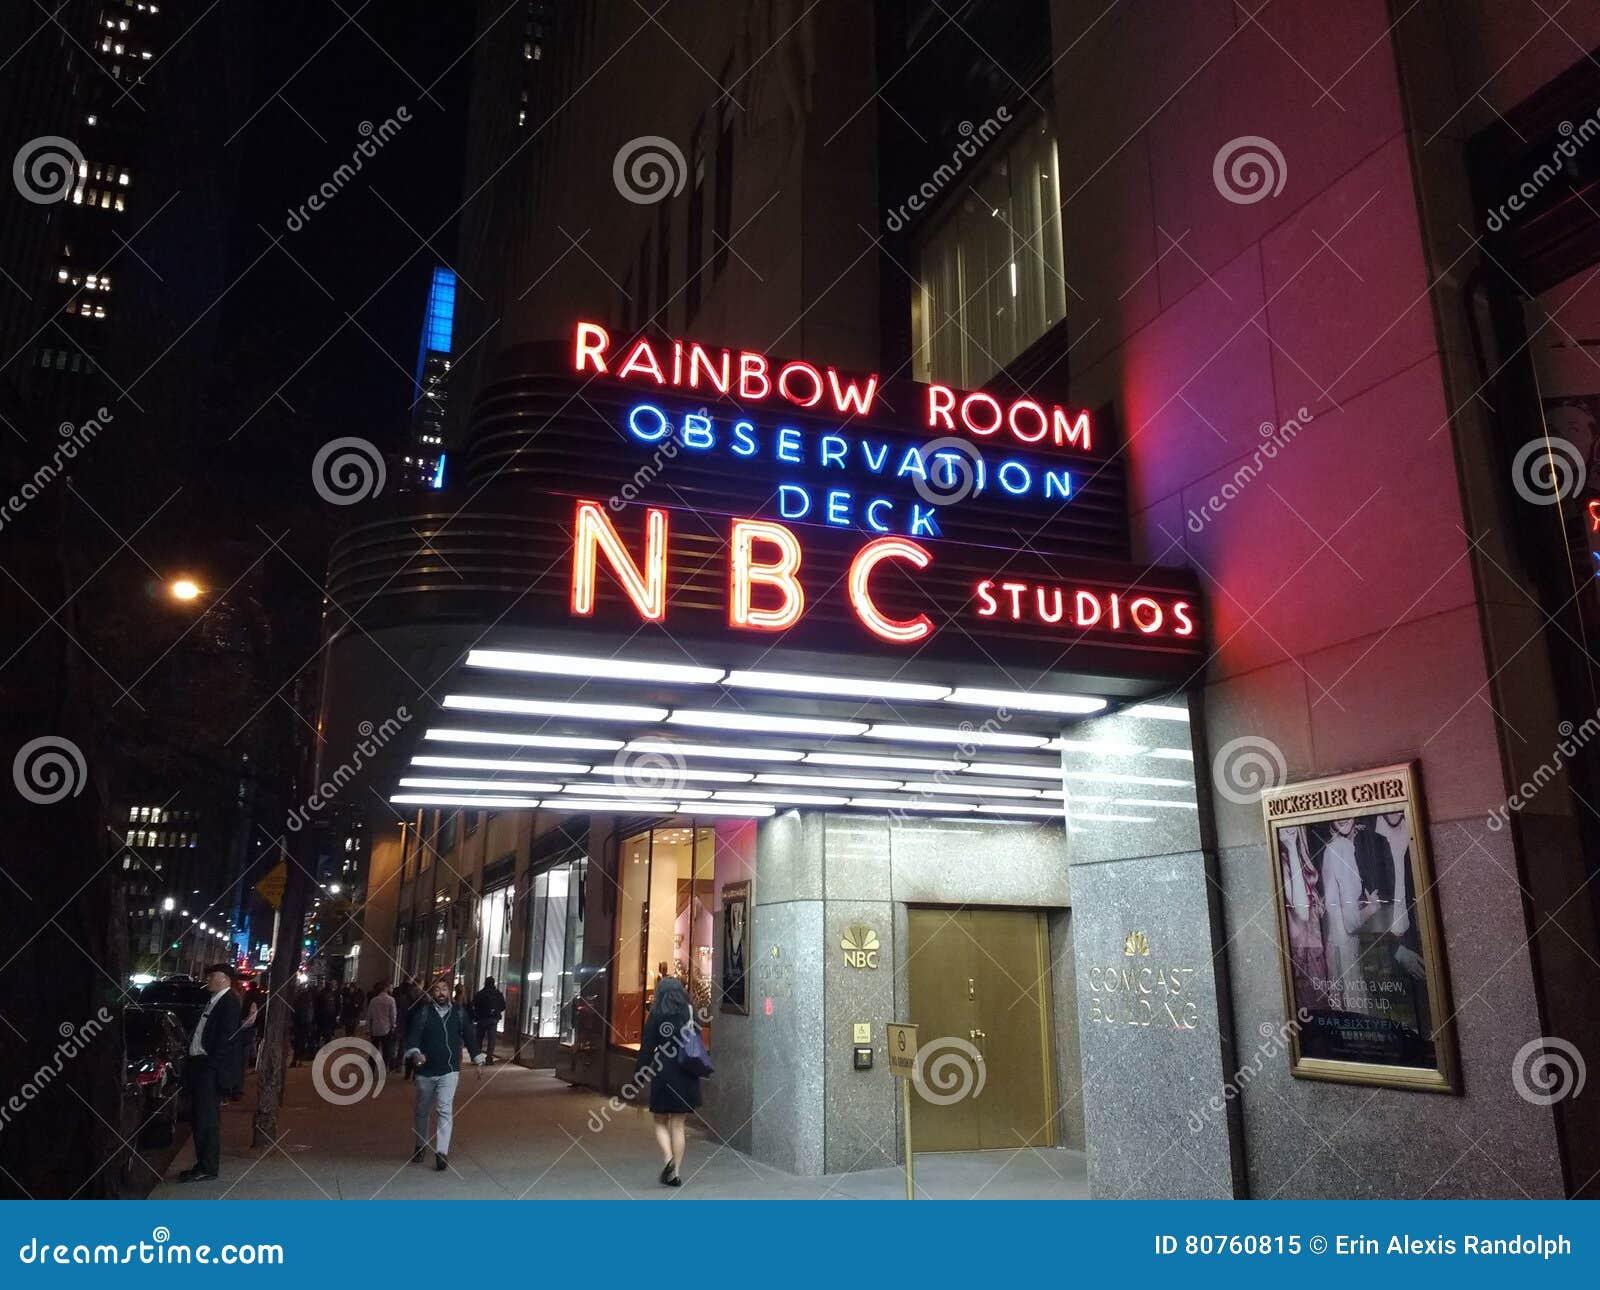 Nbc Studios Rainbow Room Observation Deck 30 Rockefeller Plaza Nyc Usa Editorial Image Image Of Couple Landmarks 80760815